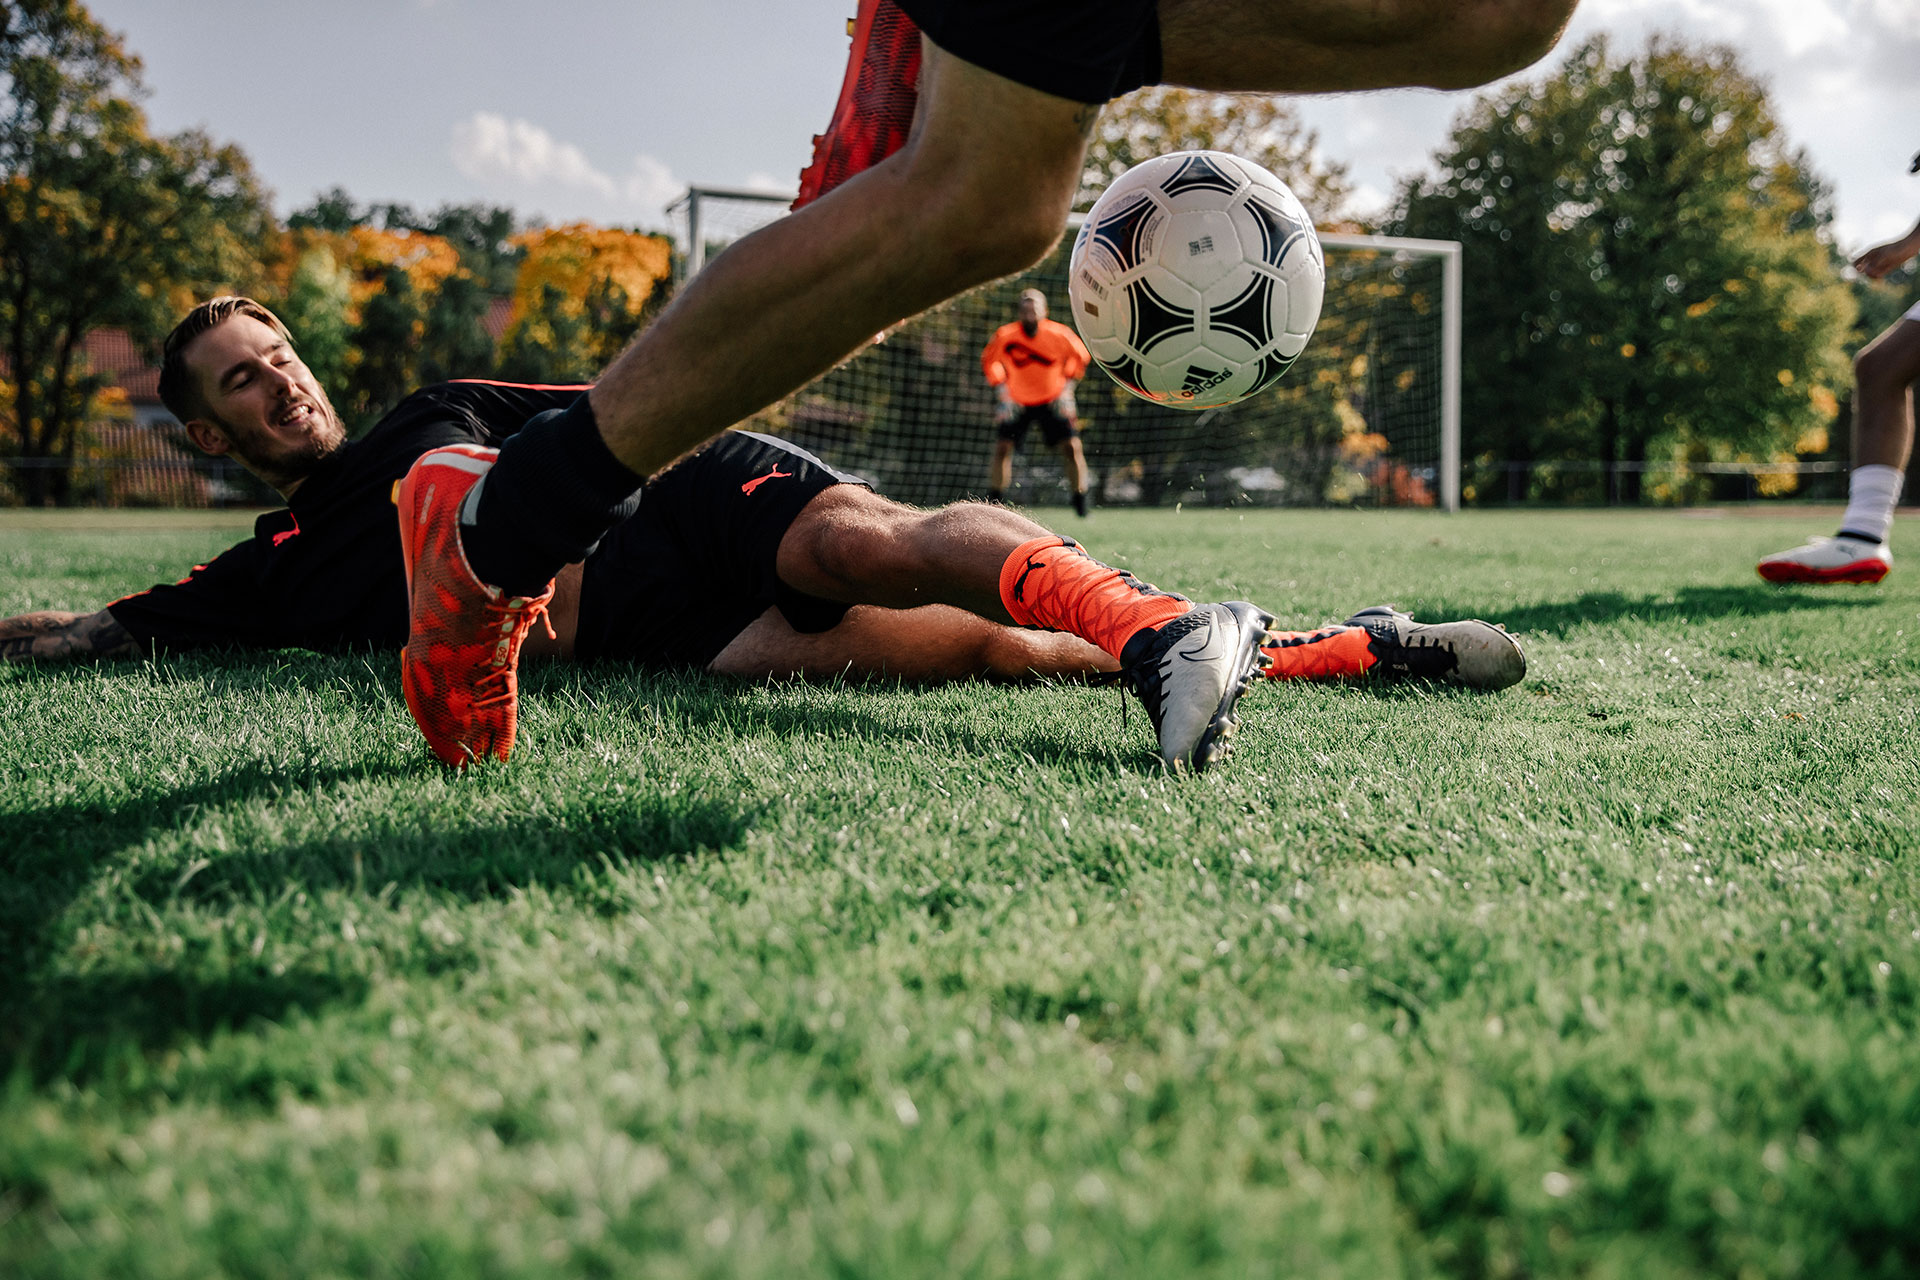 Teamsport Fotograf Sport Outdoor Fußball Aktion Adidas Kampagne berlin